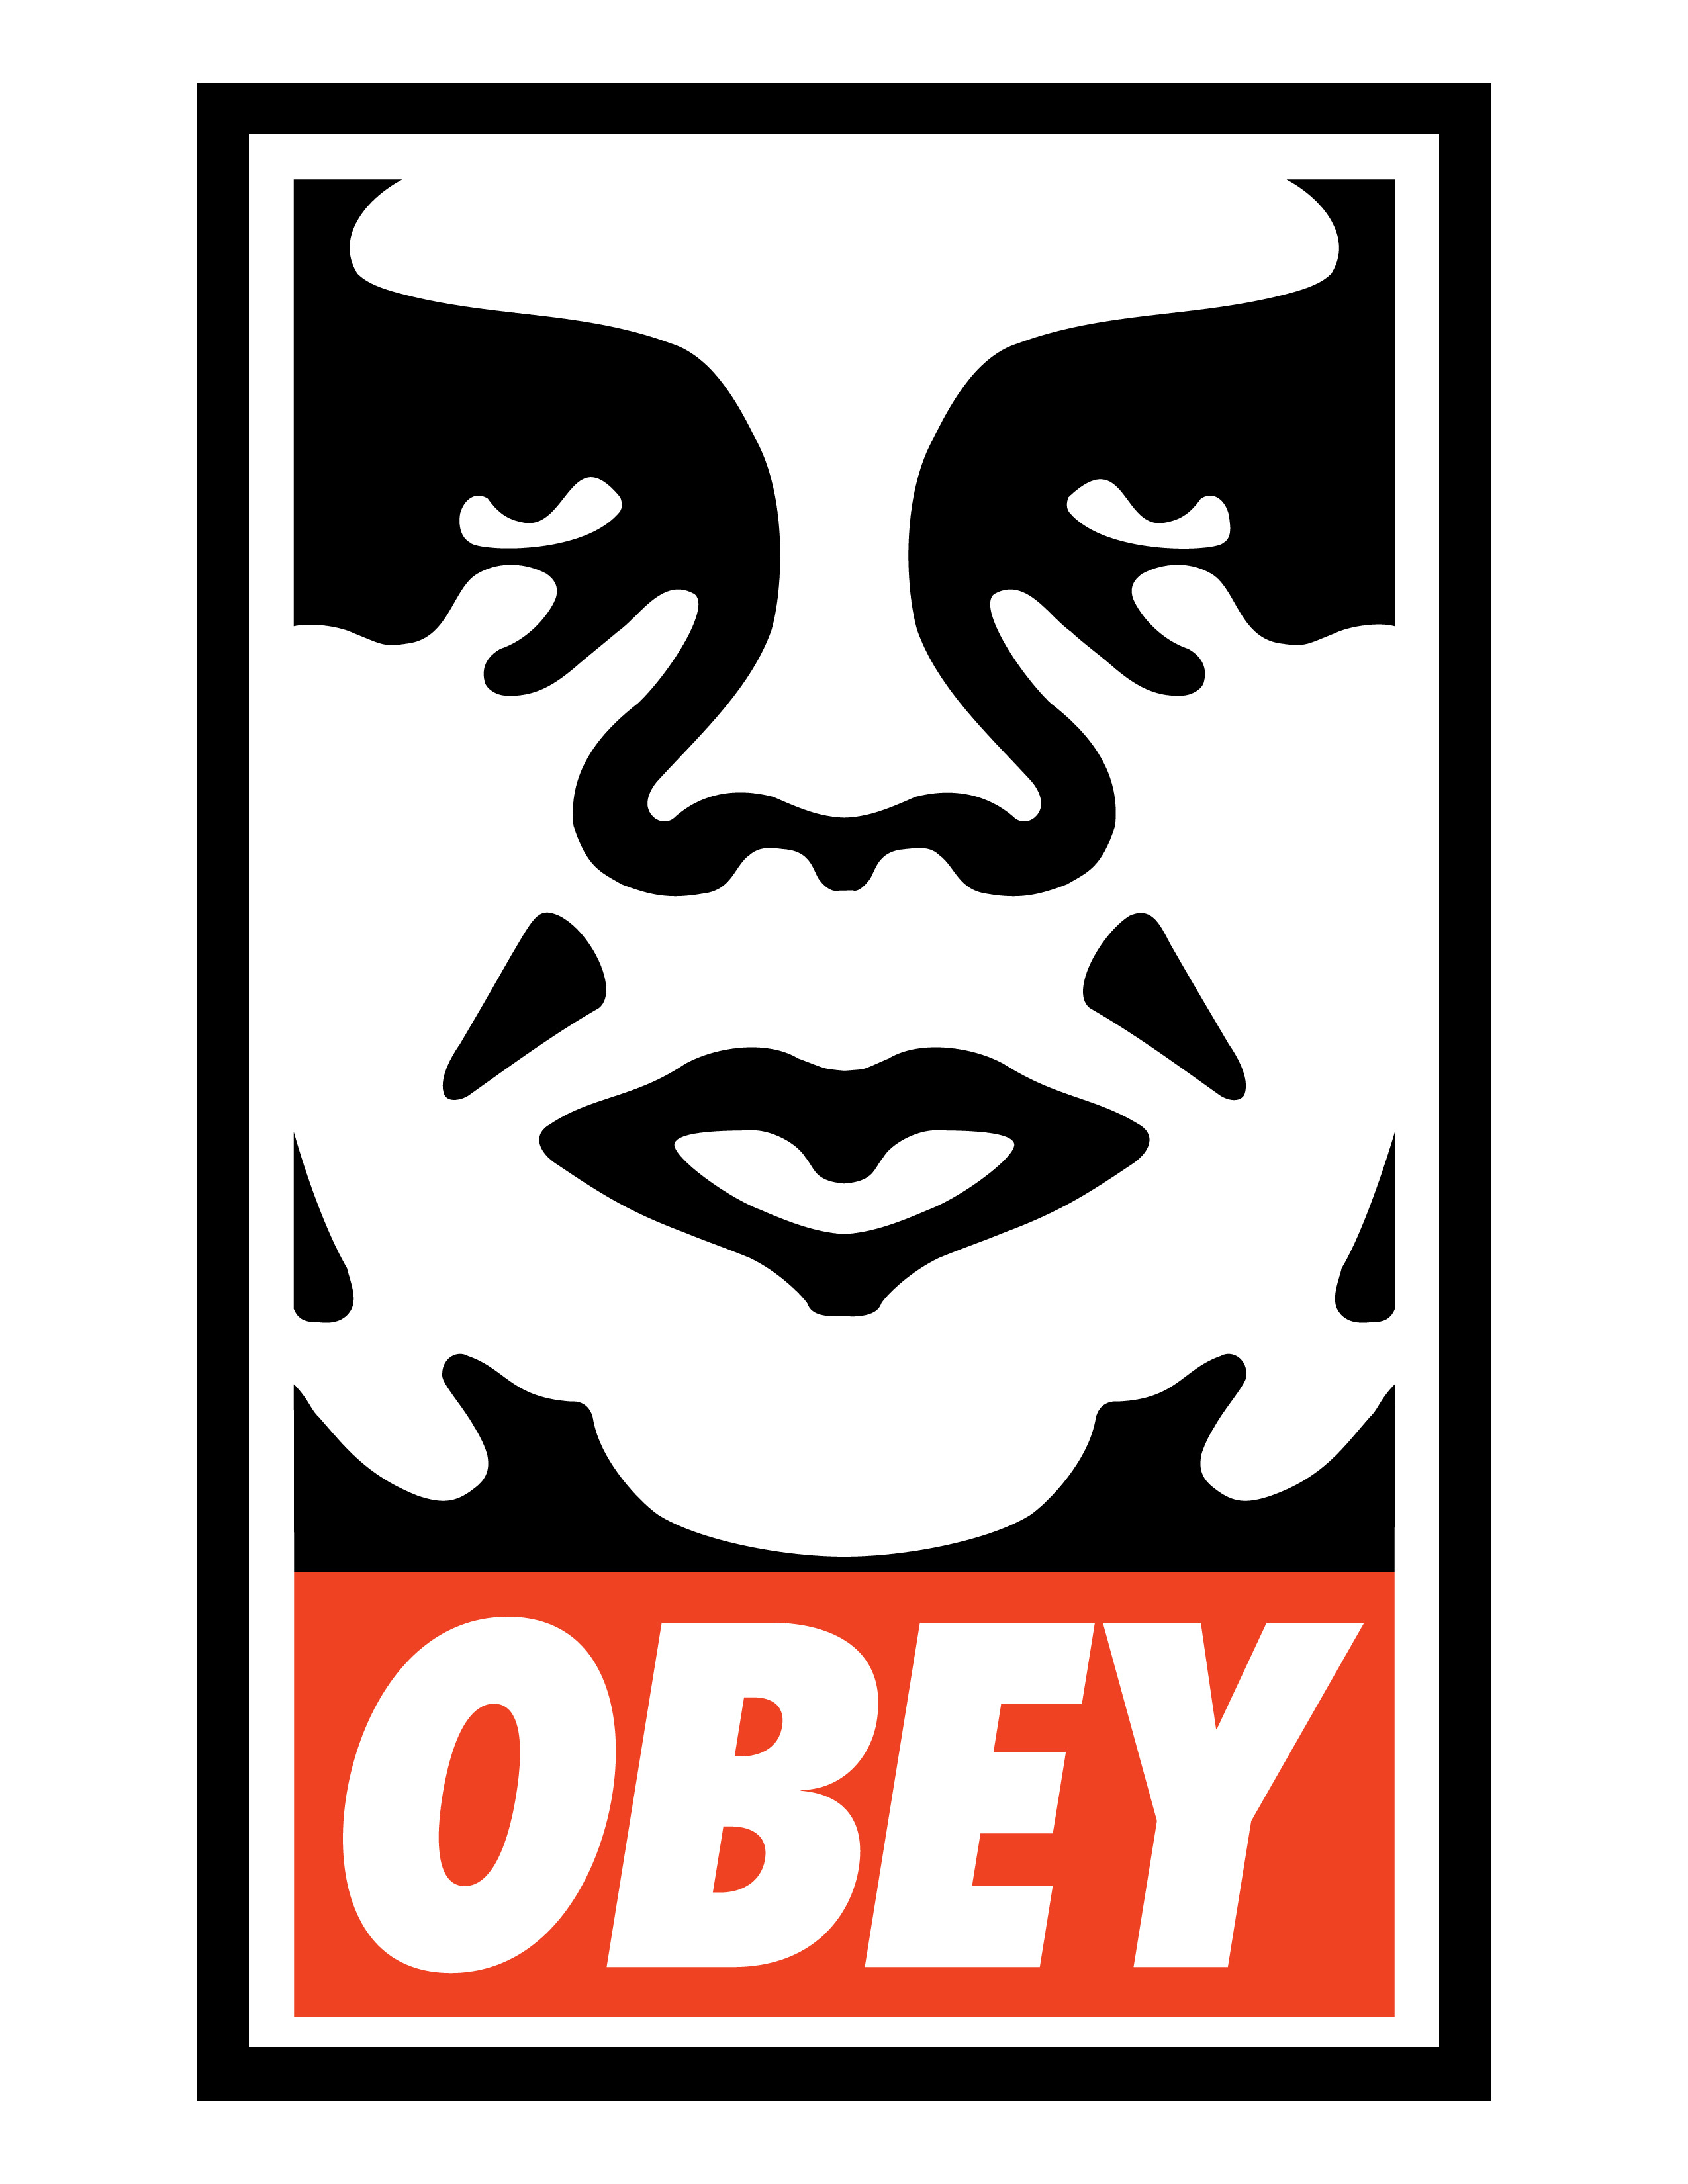 obey-pic.jpg